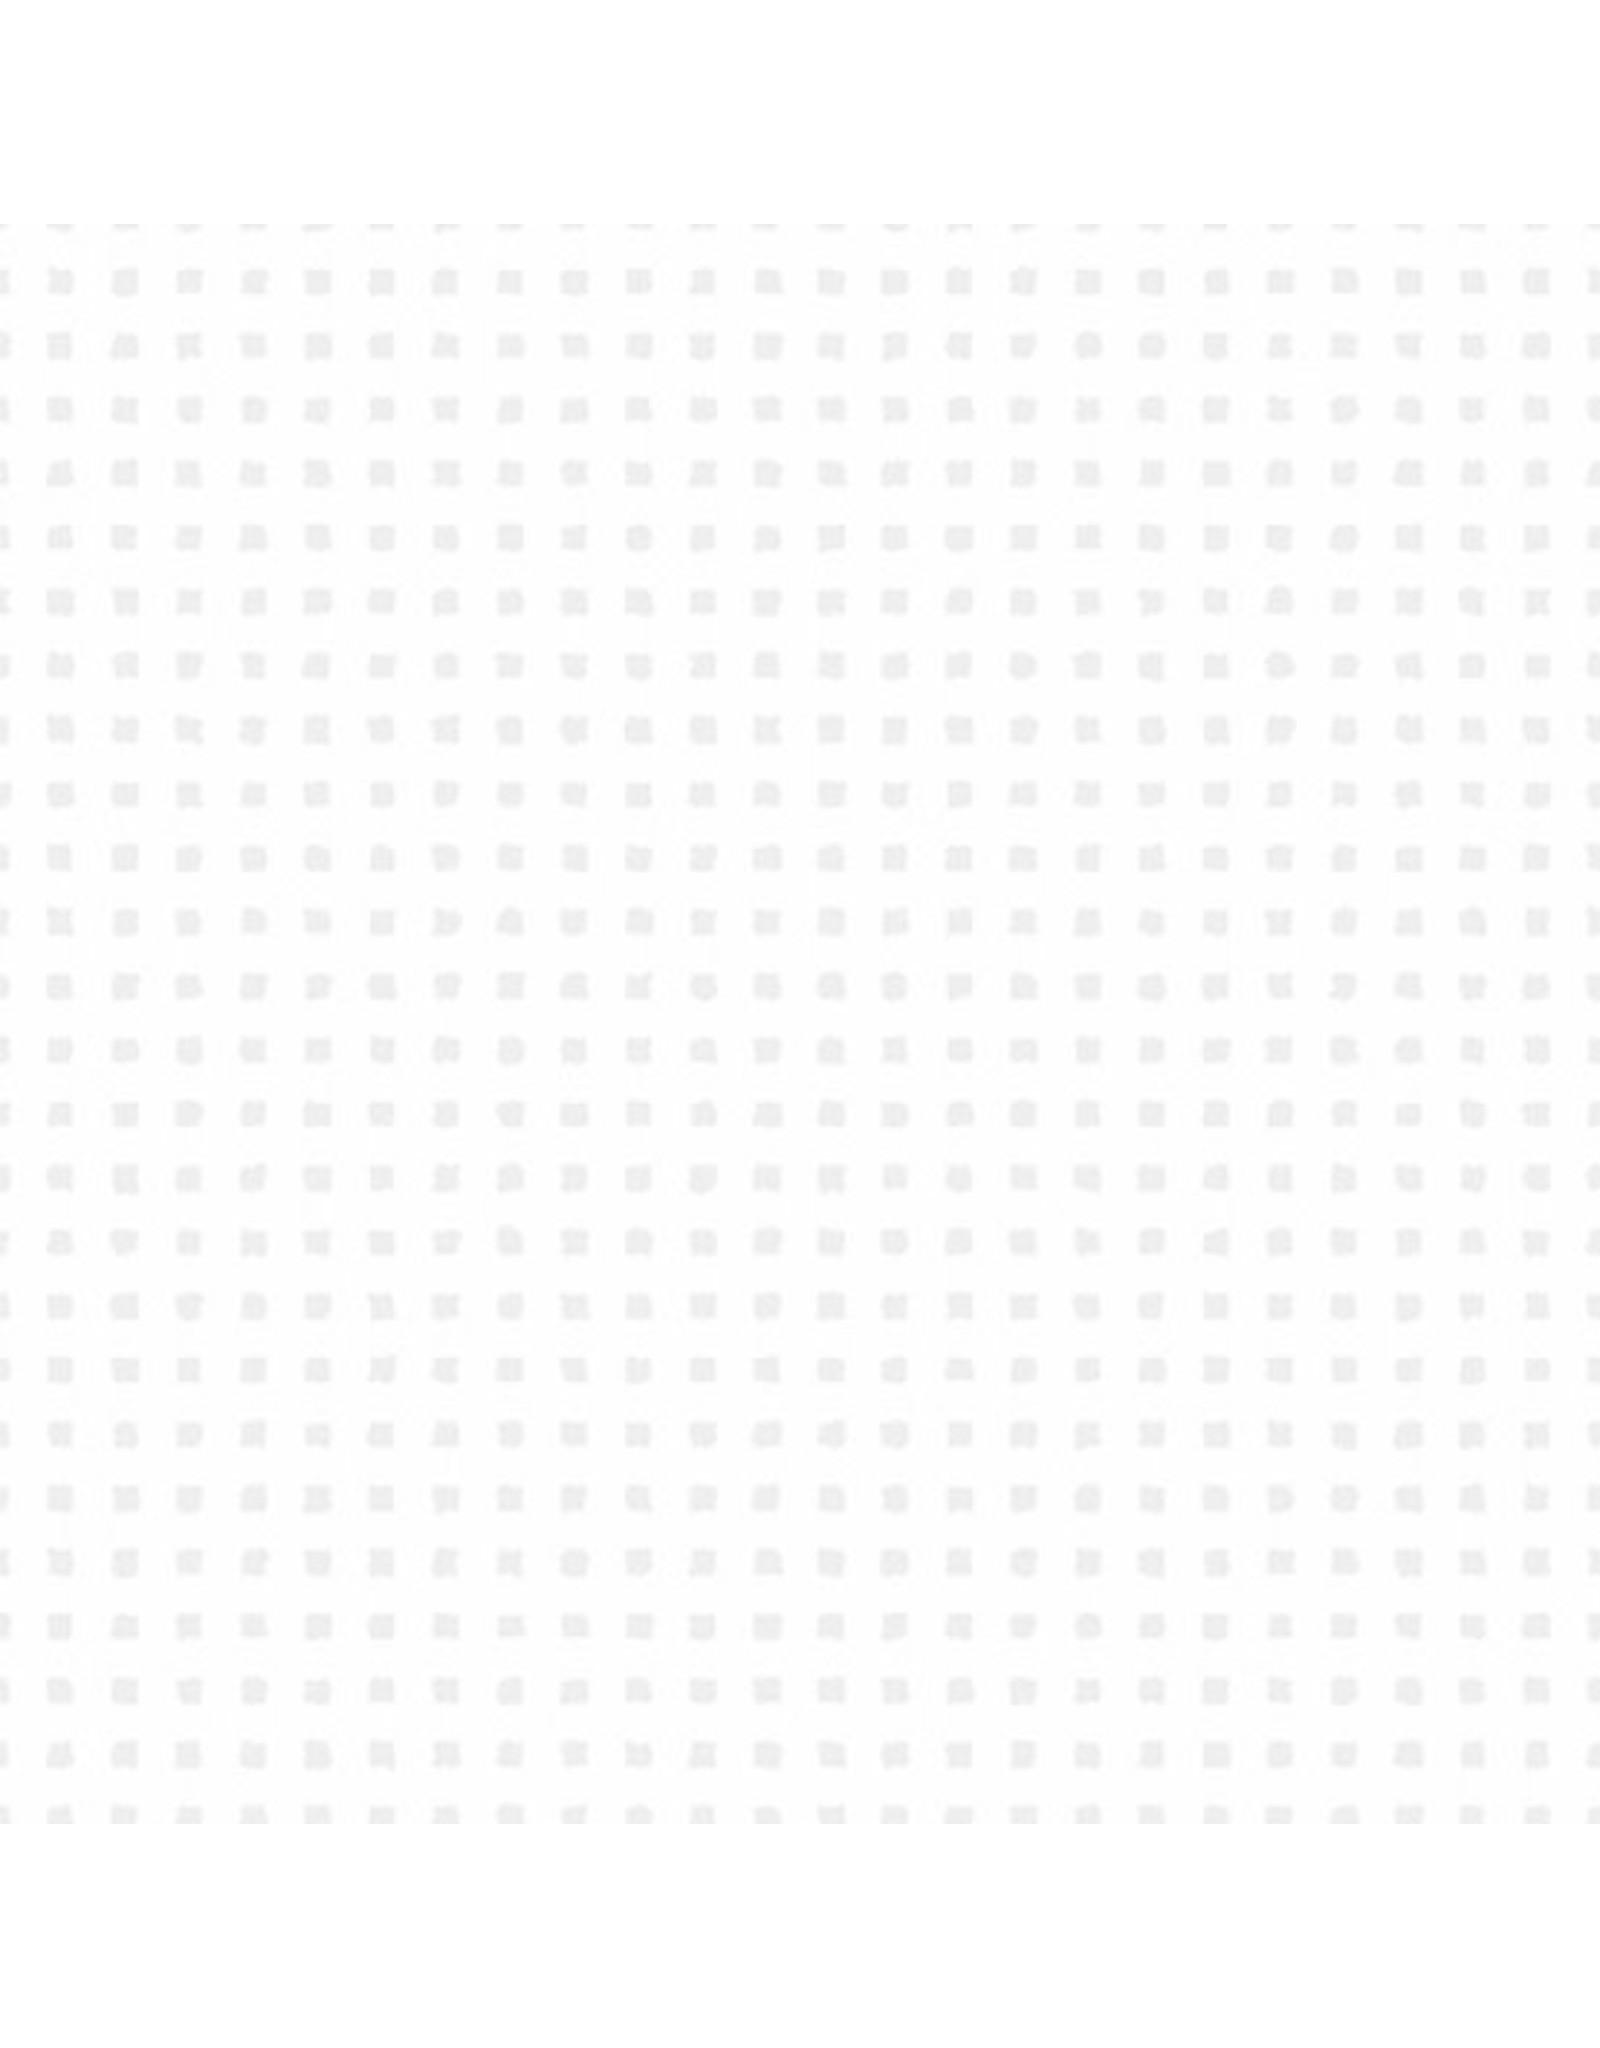 Andover Fabrics Century Whites, White on White Grid, Fabric Half-Yards